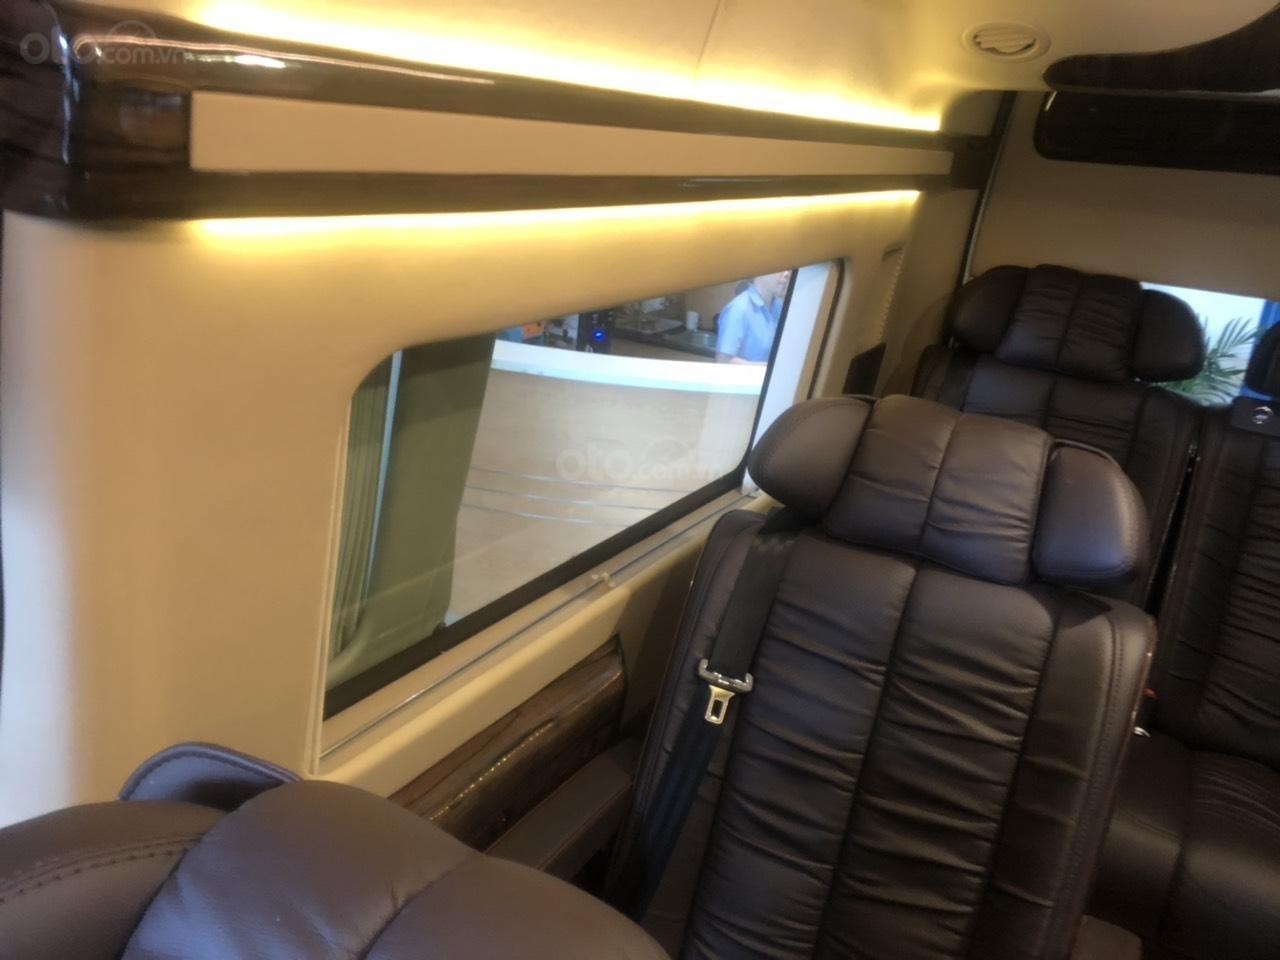 Transit Limousine 10 chỗ 2019 (4)